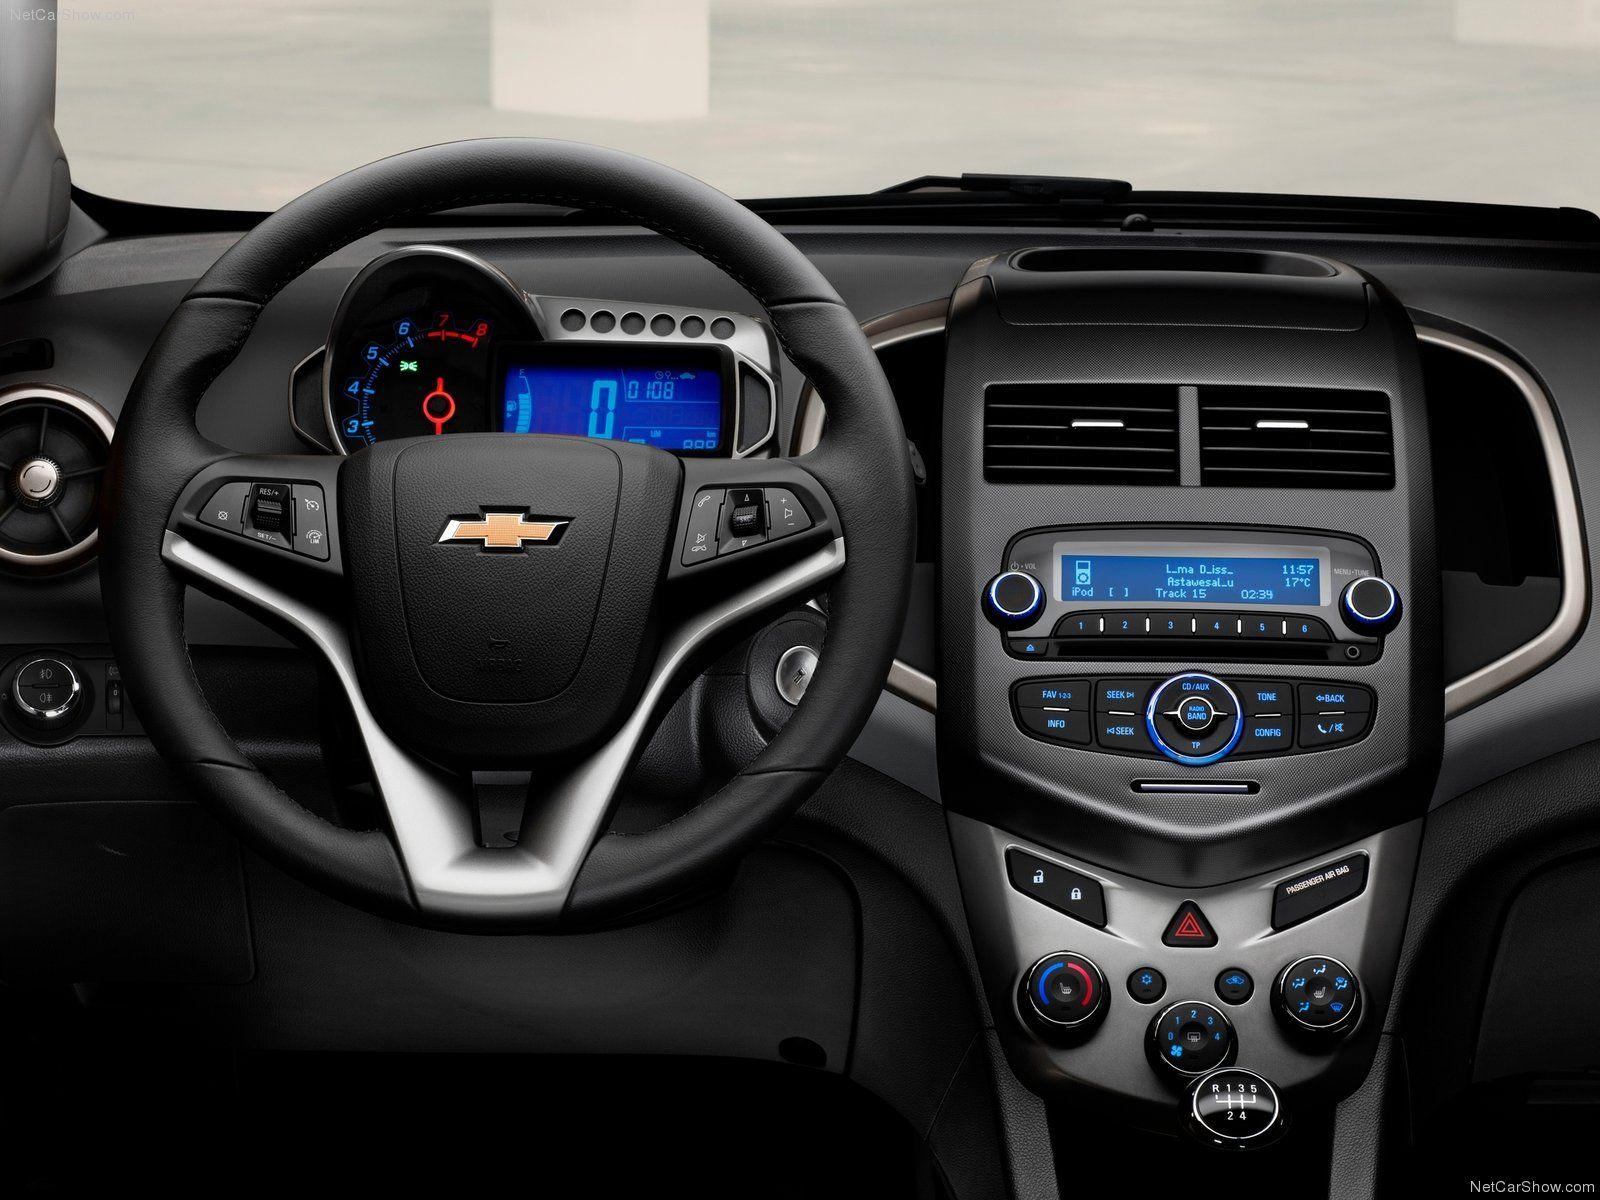 Chevy Aveo Chevrolet Aveo Chevrolet Aveo Car